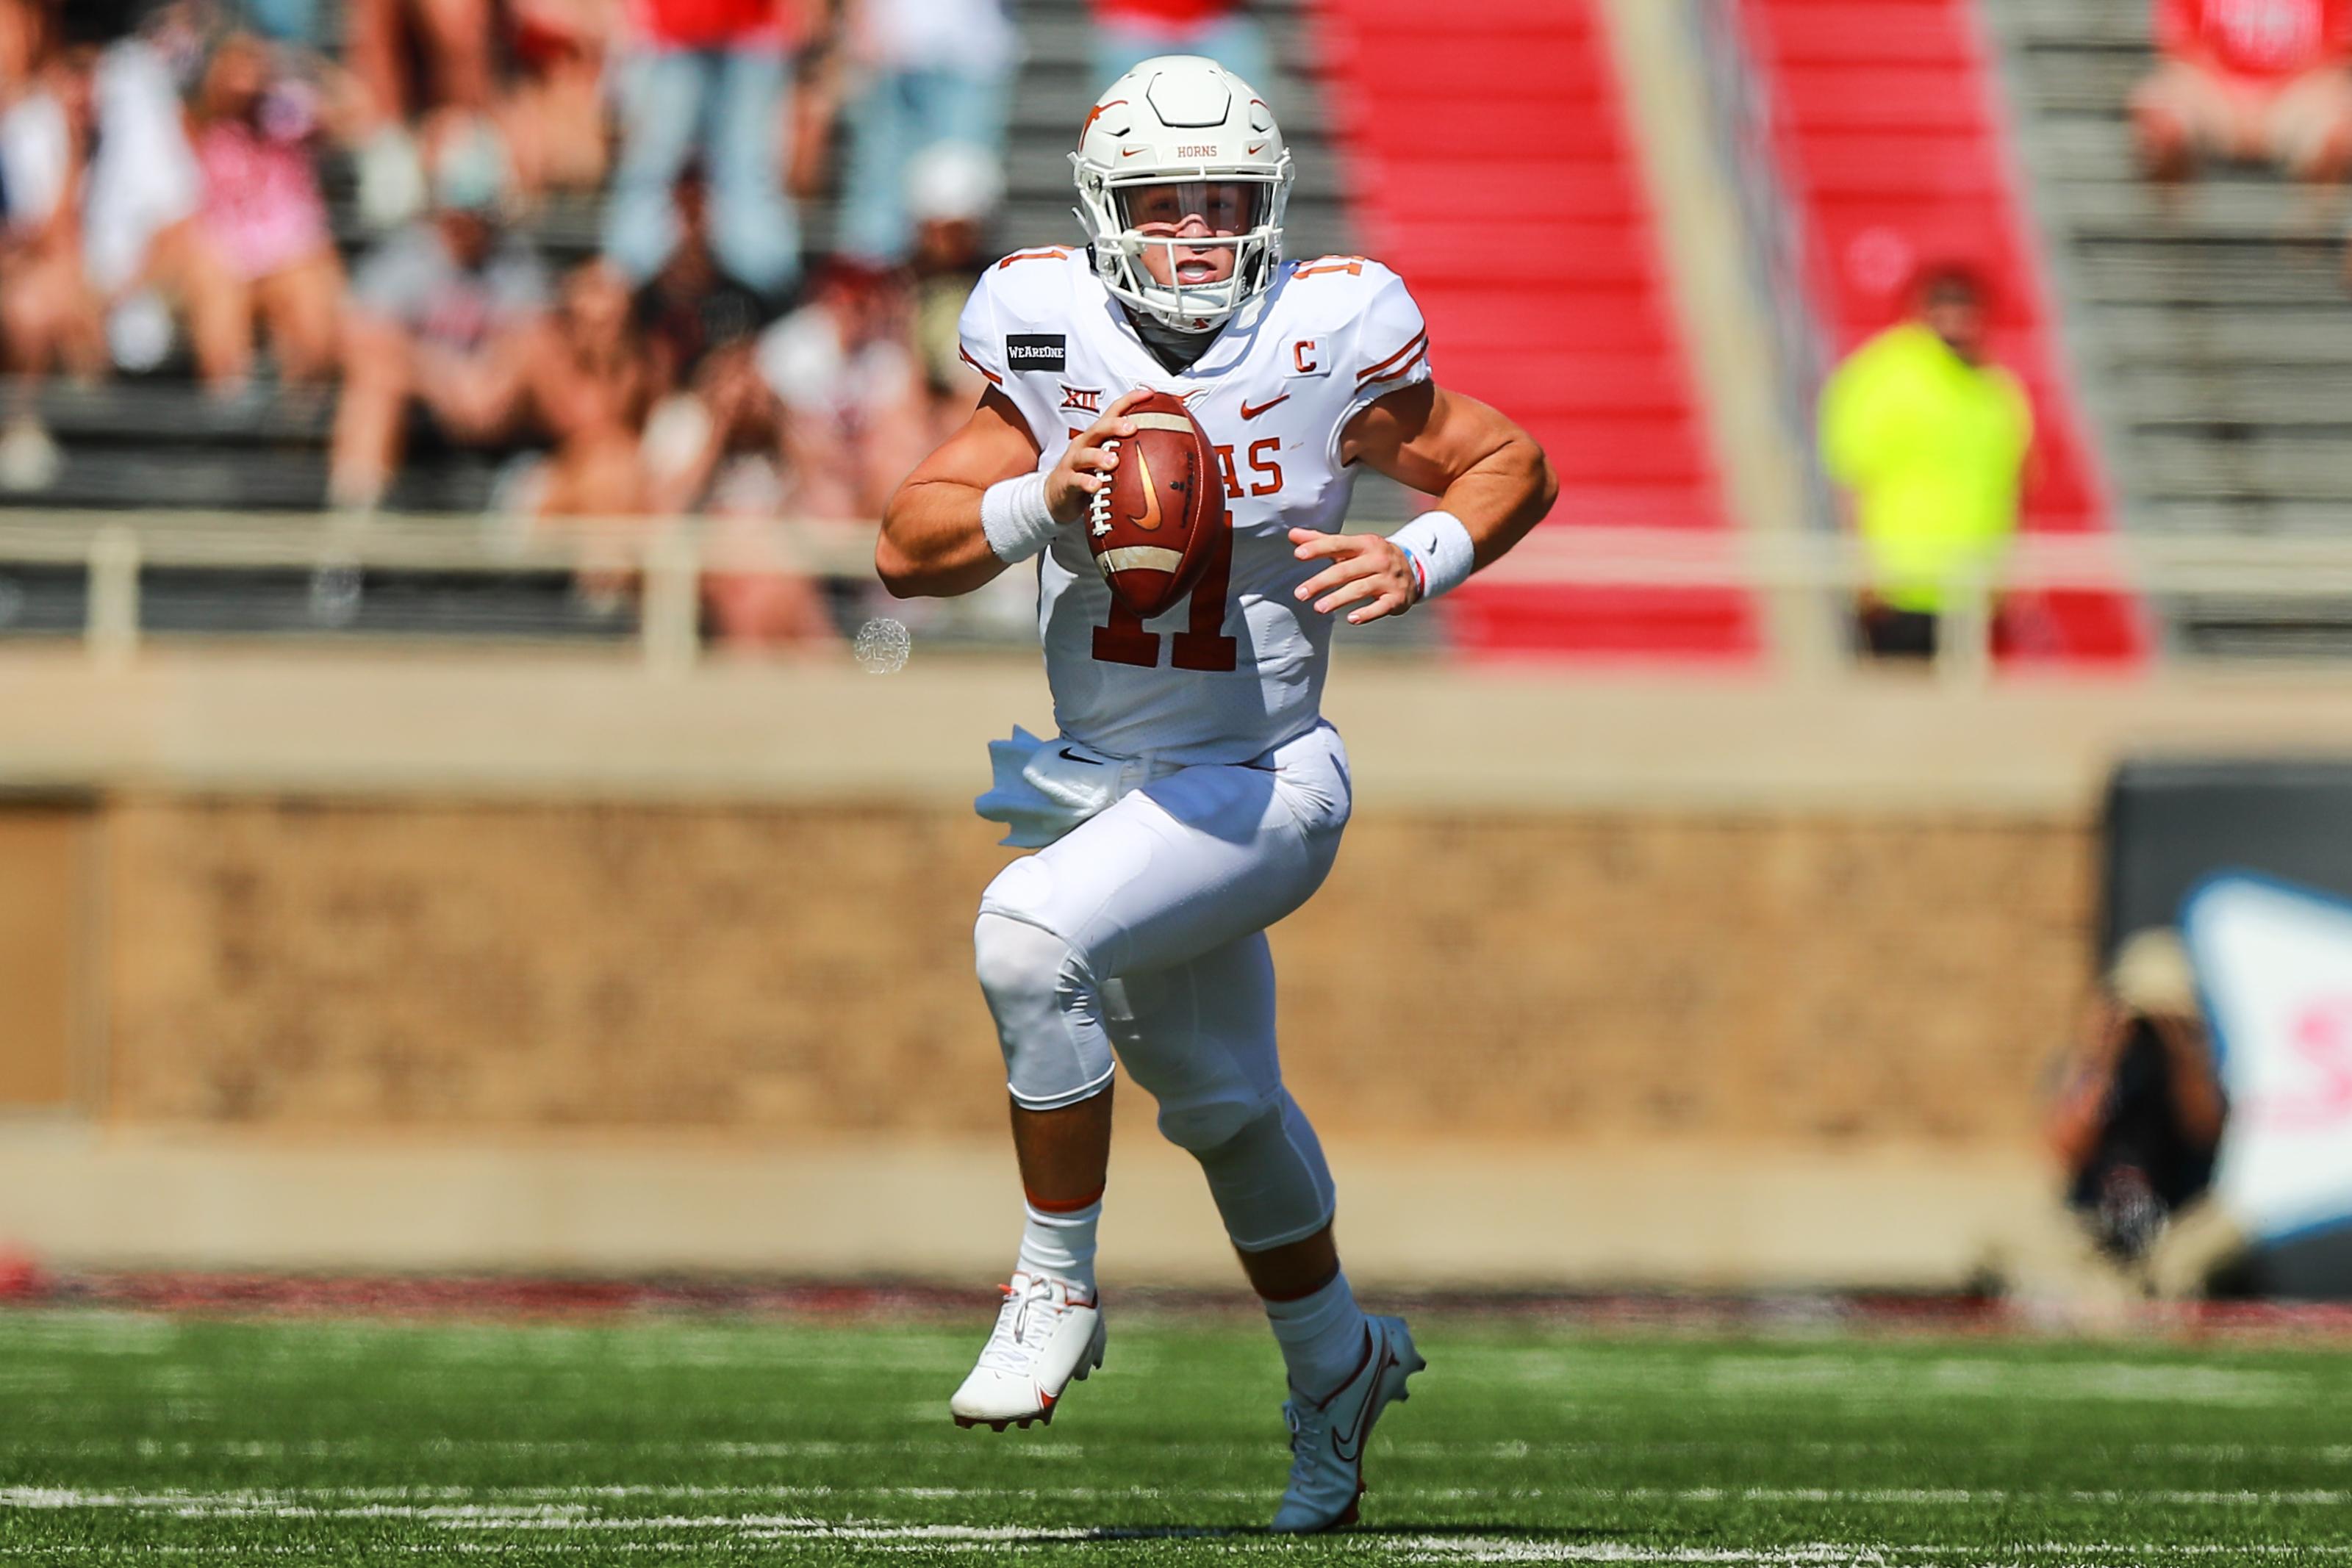 Texas Football Sam Ehlinger Breaks Records In Win Over Texas Tech